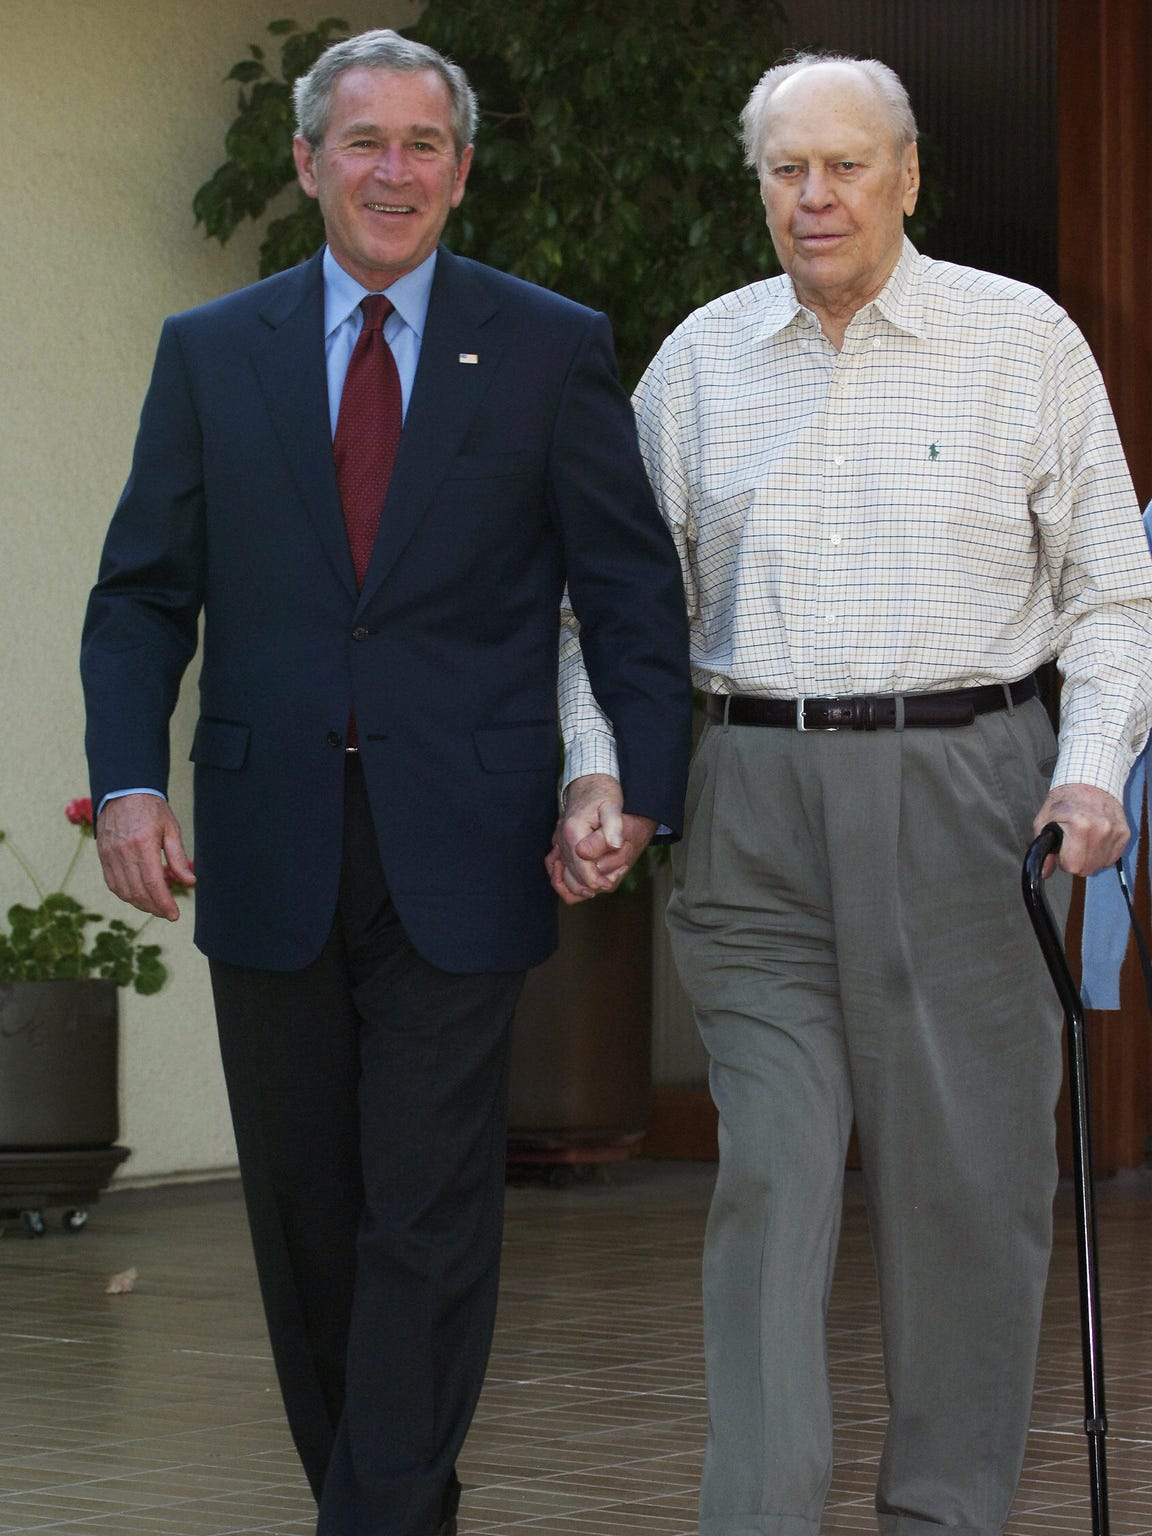 President George W. Bush (L) walks with former president